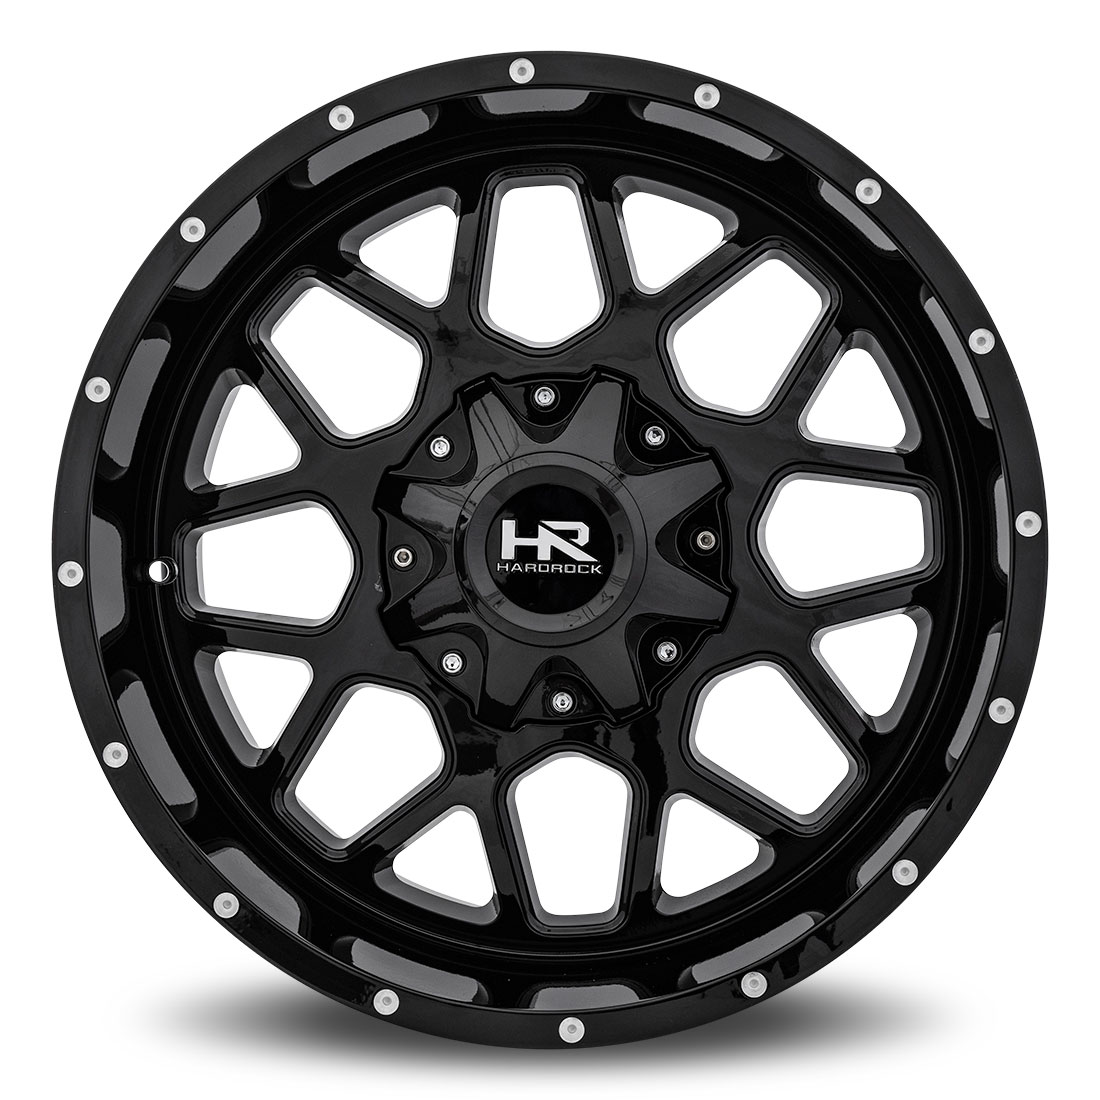 Hardrock Offroad Wheels H705 Gunner  Black Dimples 20x10